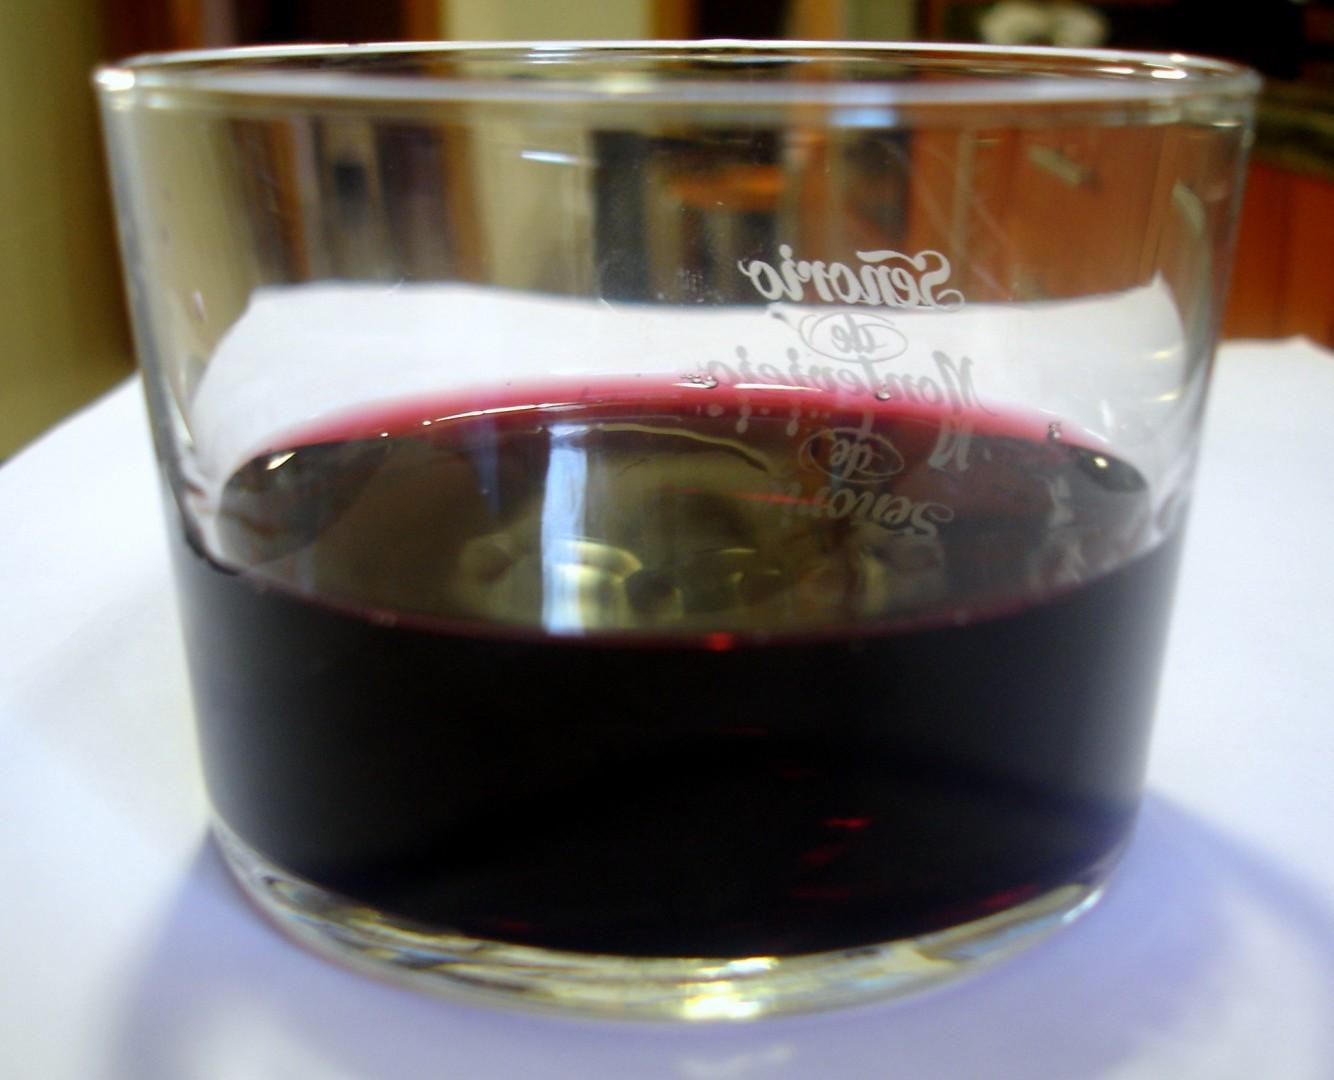 chato de vino